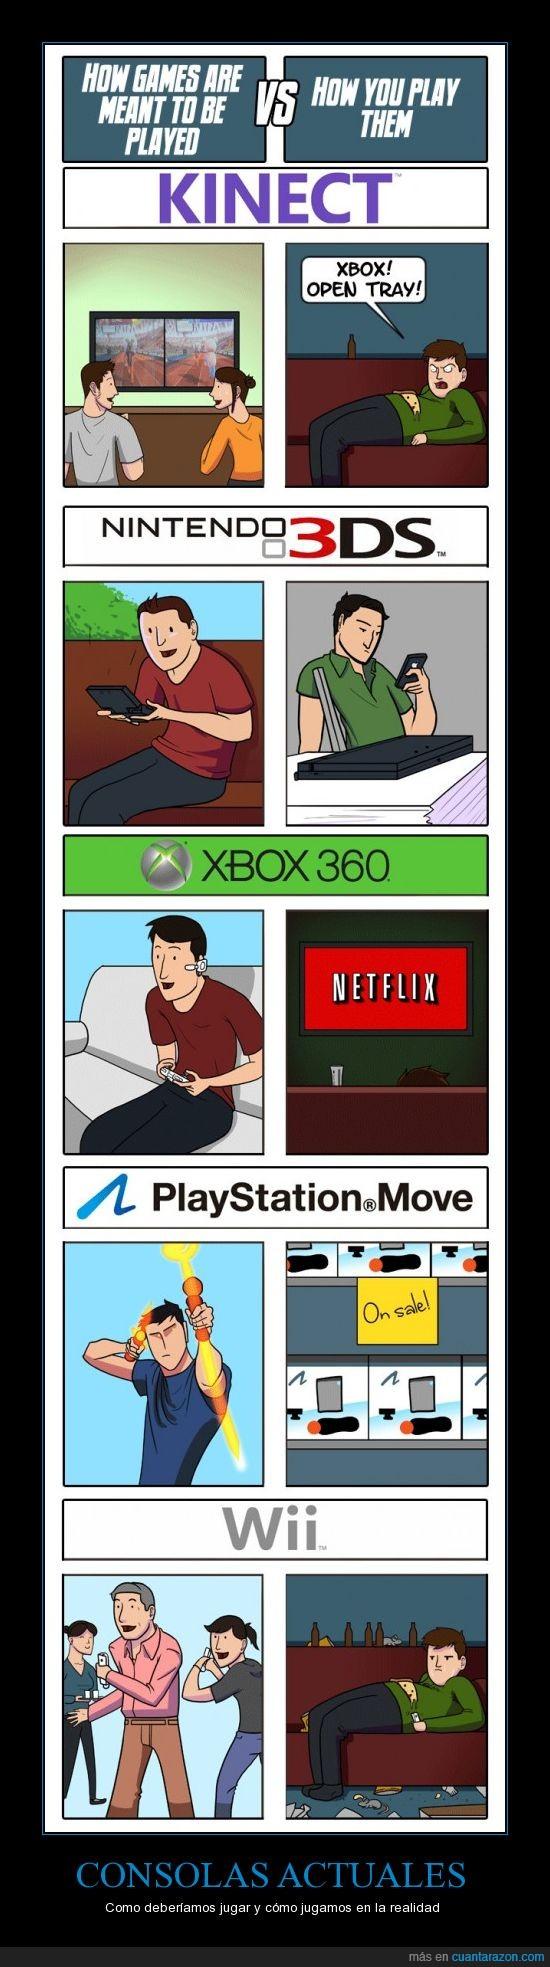 ds,nintendo,nintendo 3ds,playstation,ps3,wii,xbox,xbox 360,xbox360